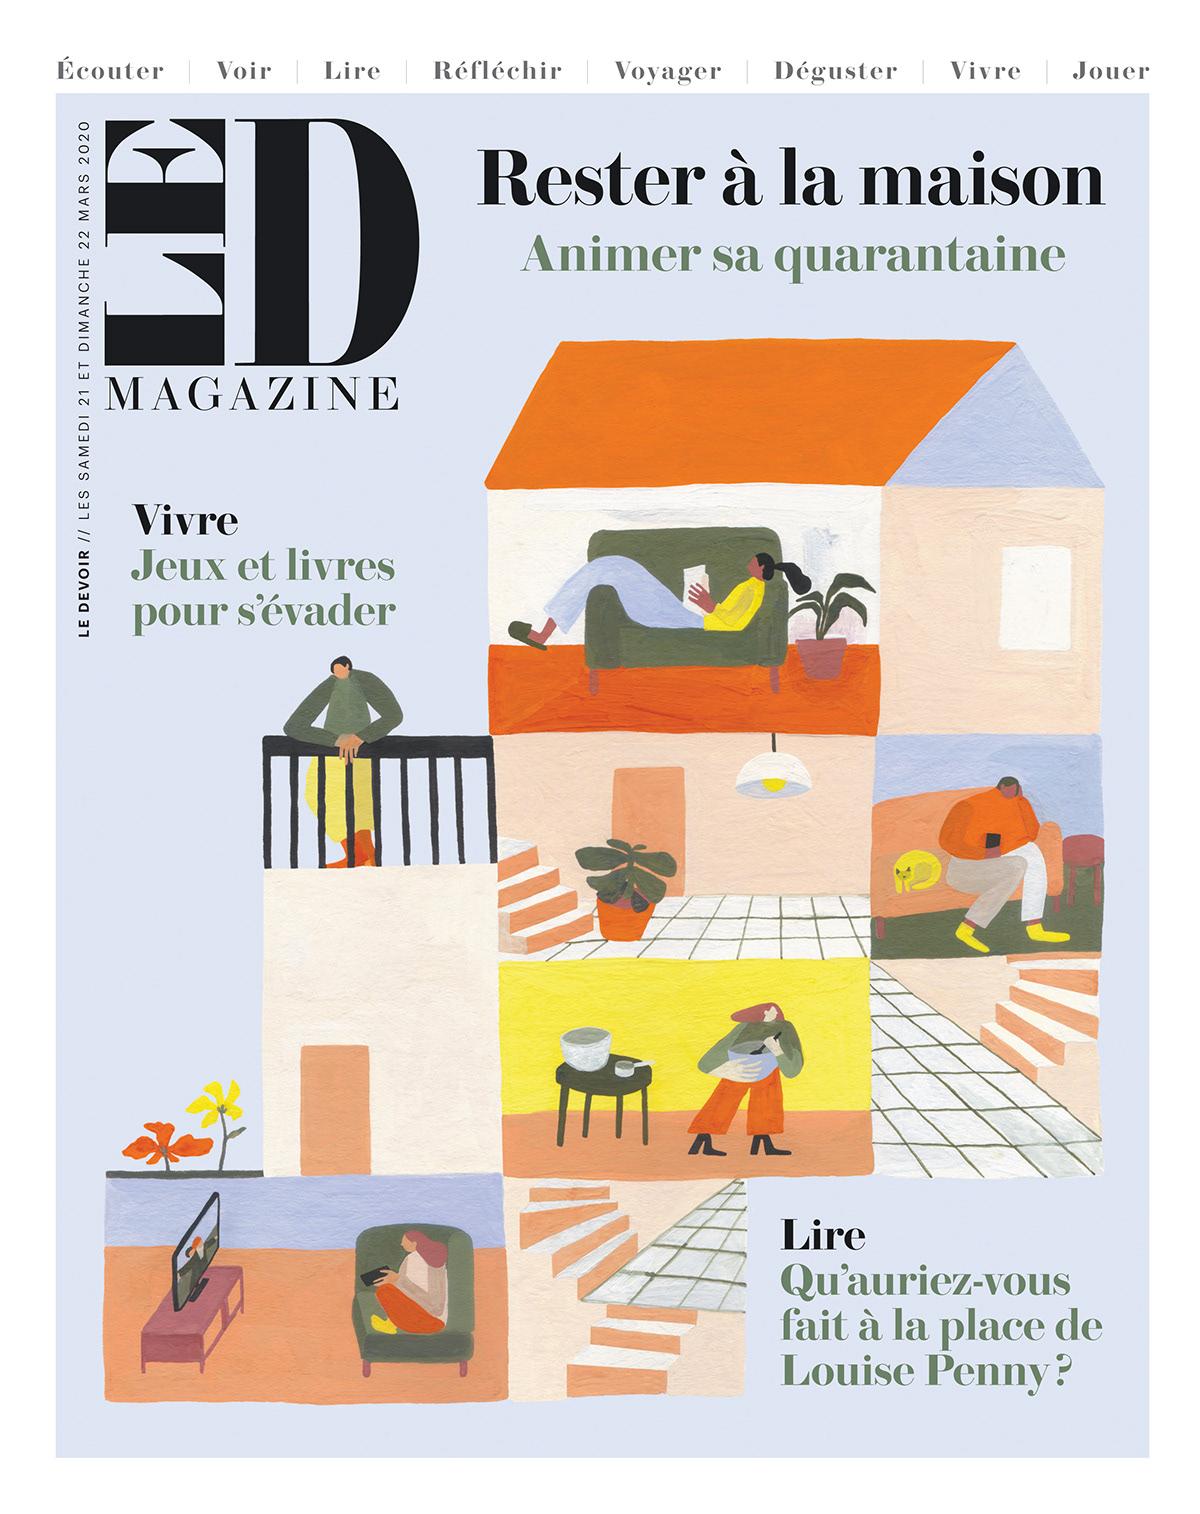 book COVID-19 Culturel home Quarantine stay home editorial ILLUSTRATION  le devoir gouache